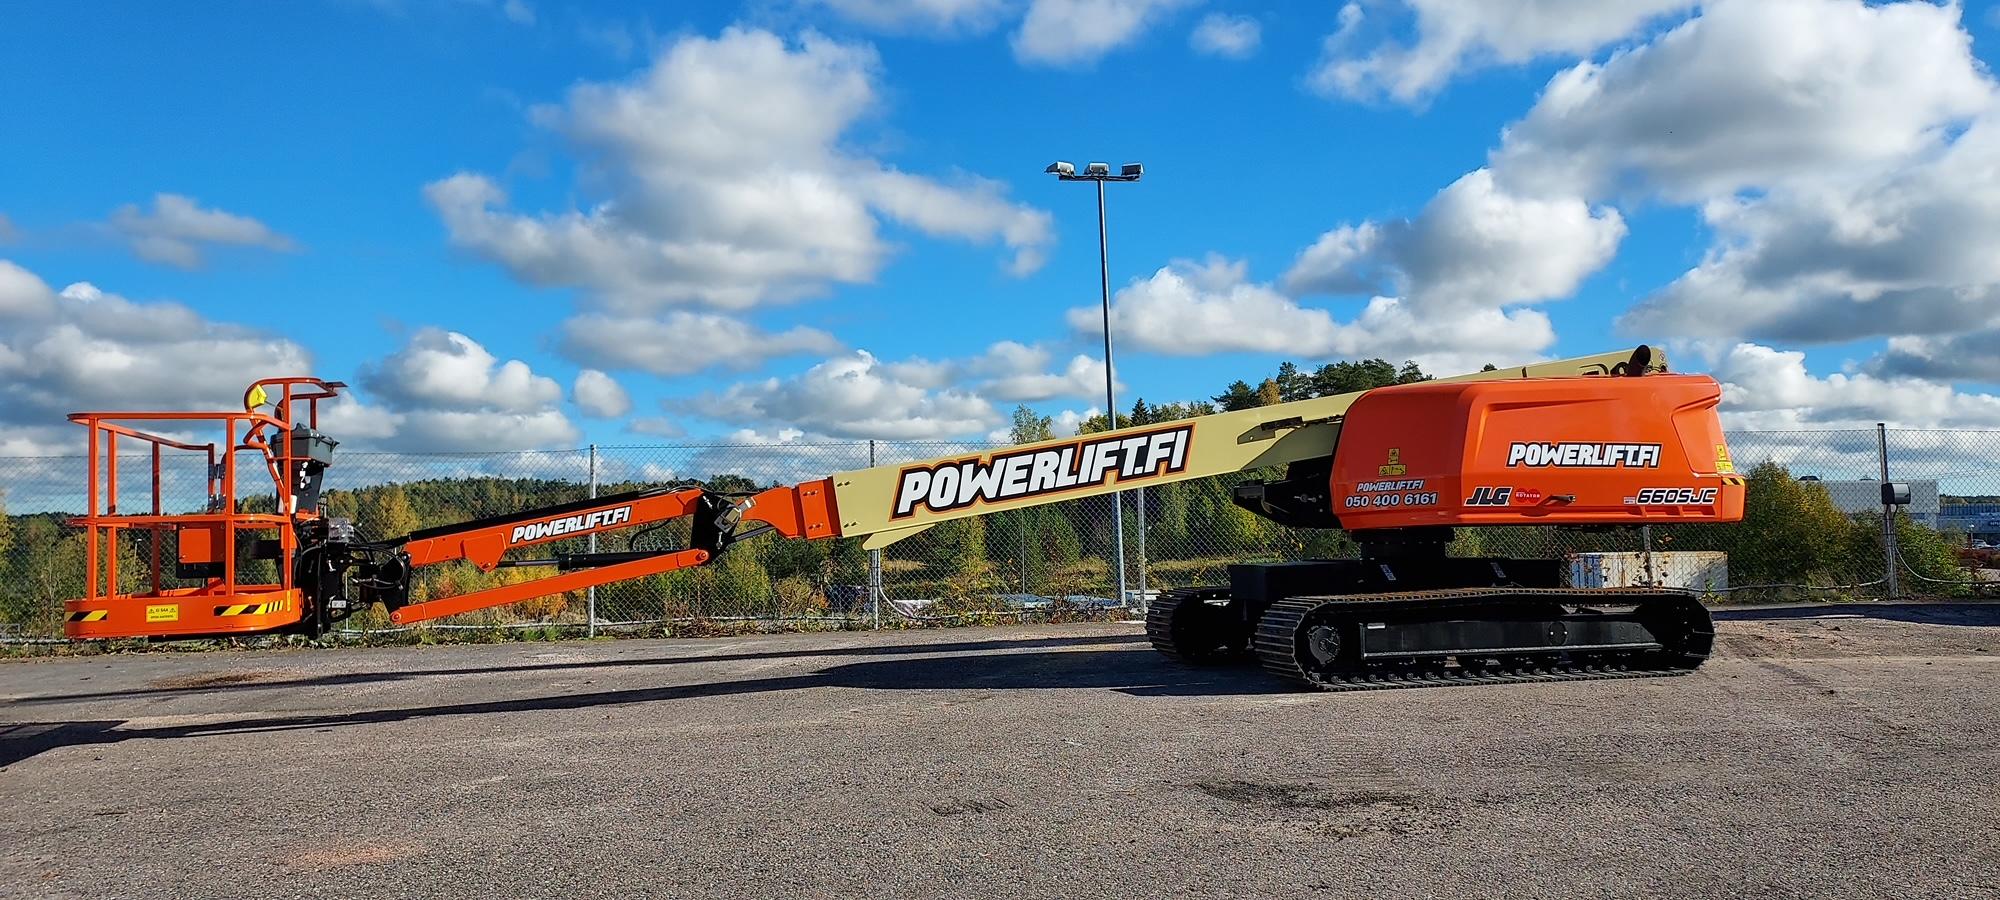 Powerlift-uutiset